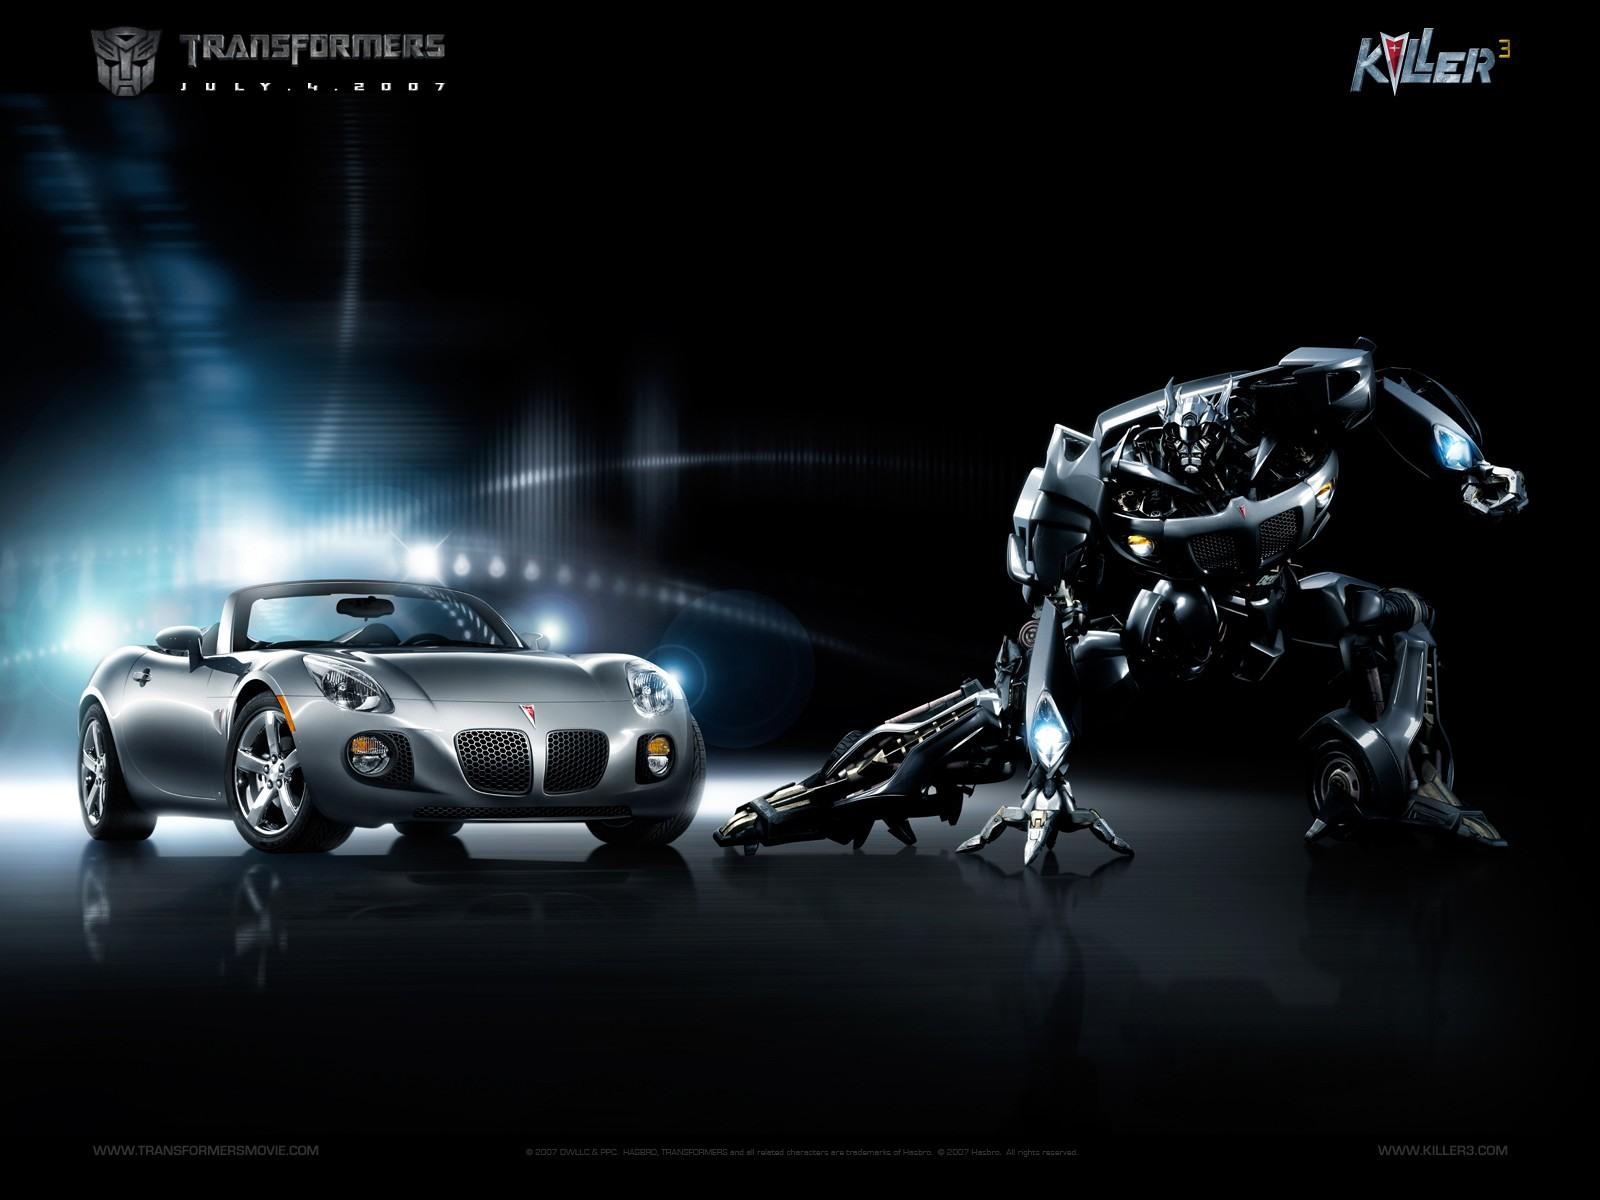 http://2.bp.blogspot.com/-Nb3Ij4KEMvc/UW9hk9IemRI/AAAAAAAArns/juHe2s_un9w/s1600/Transformers+wallpaper+(5).jpg